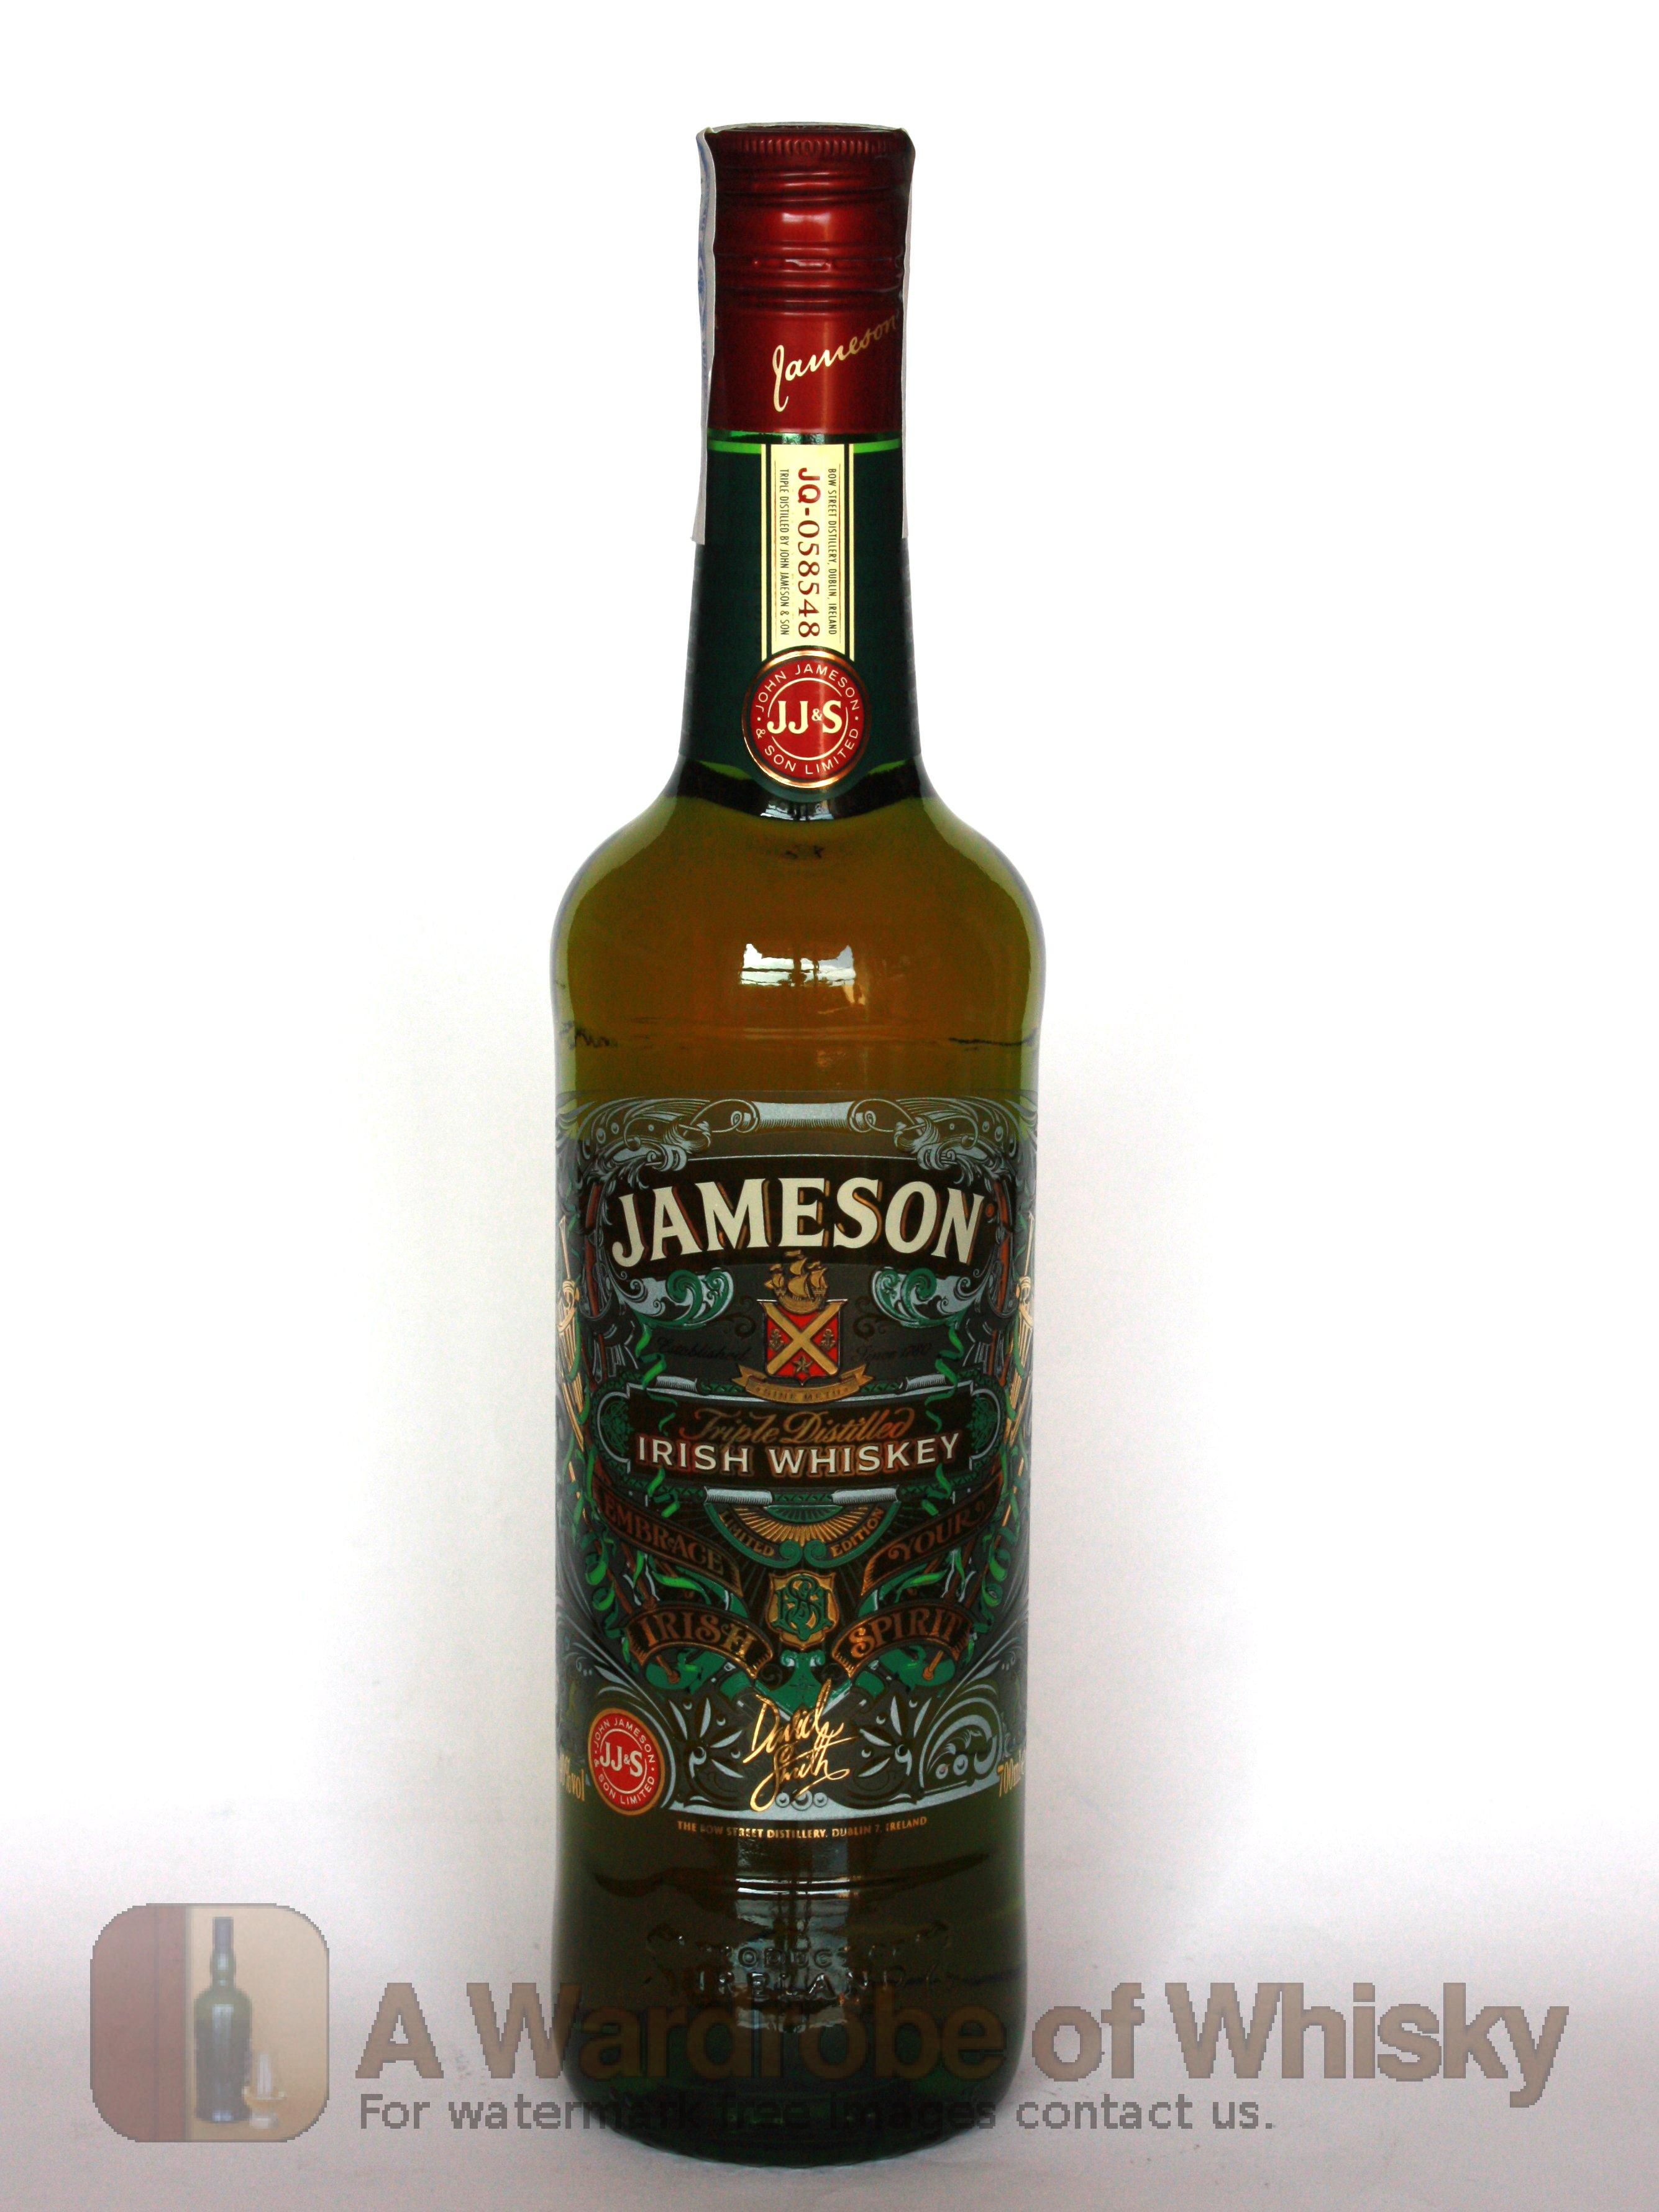 Buy Jameson Limited Edition 2013 Irish Whiskey Jameson